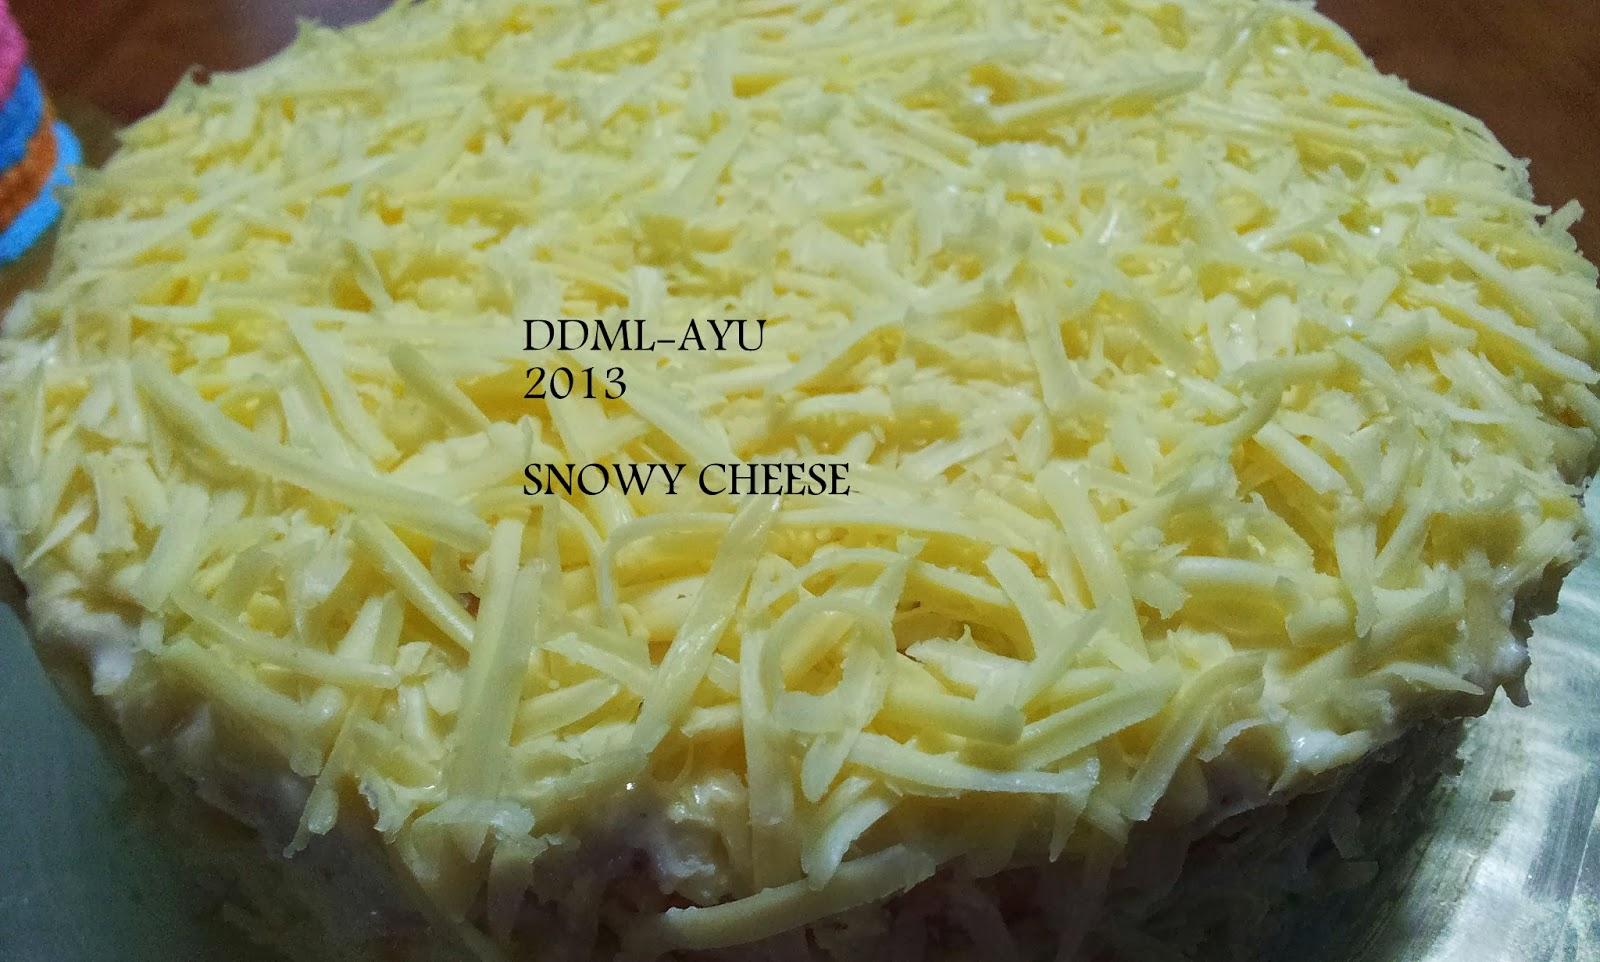 Parutkan Cheddar Cheese Di Atas Kek Tadi